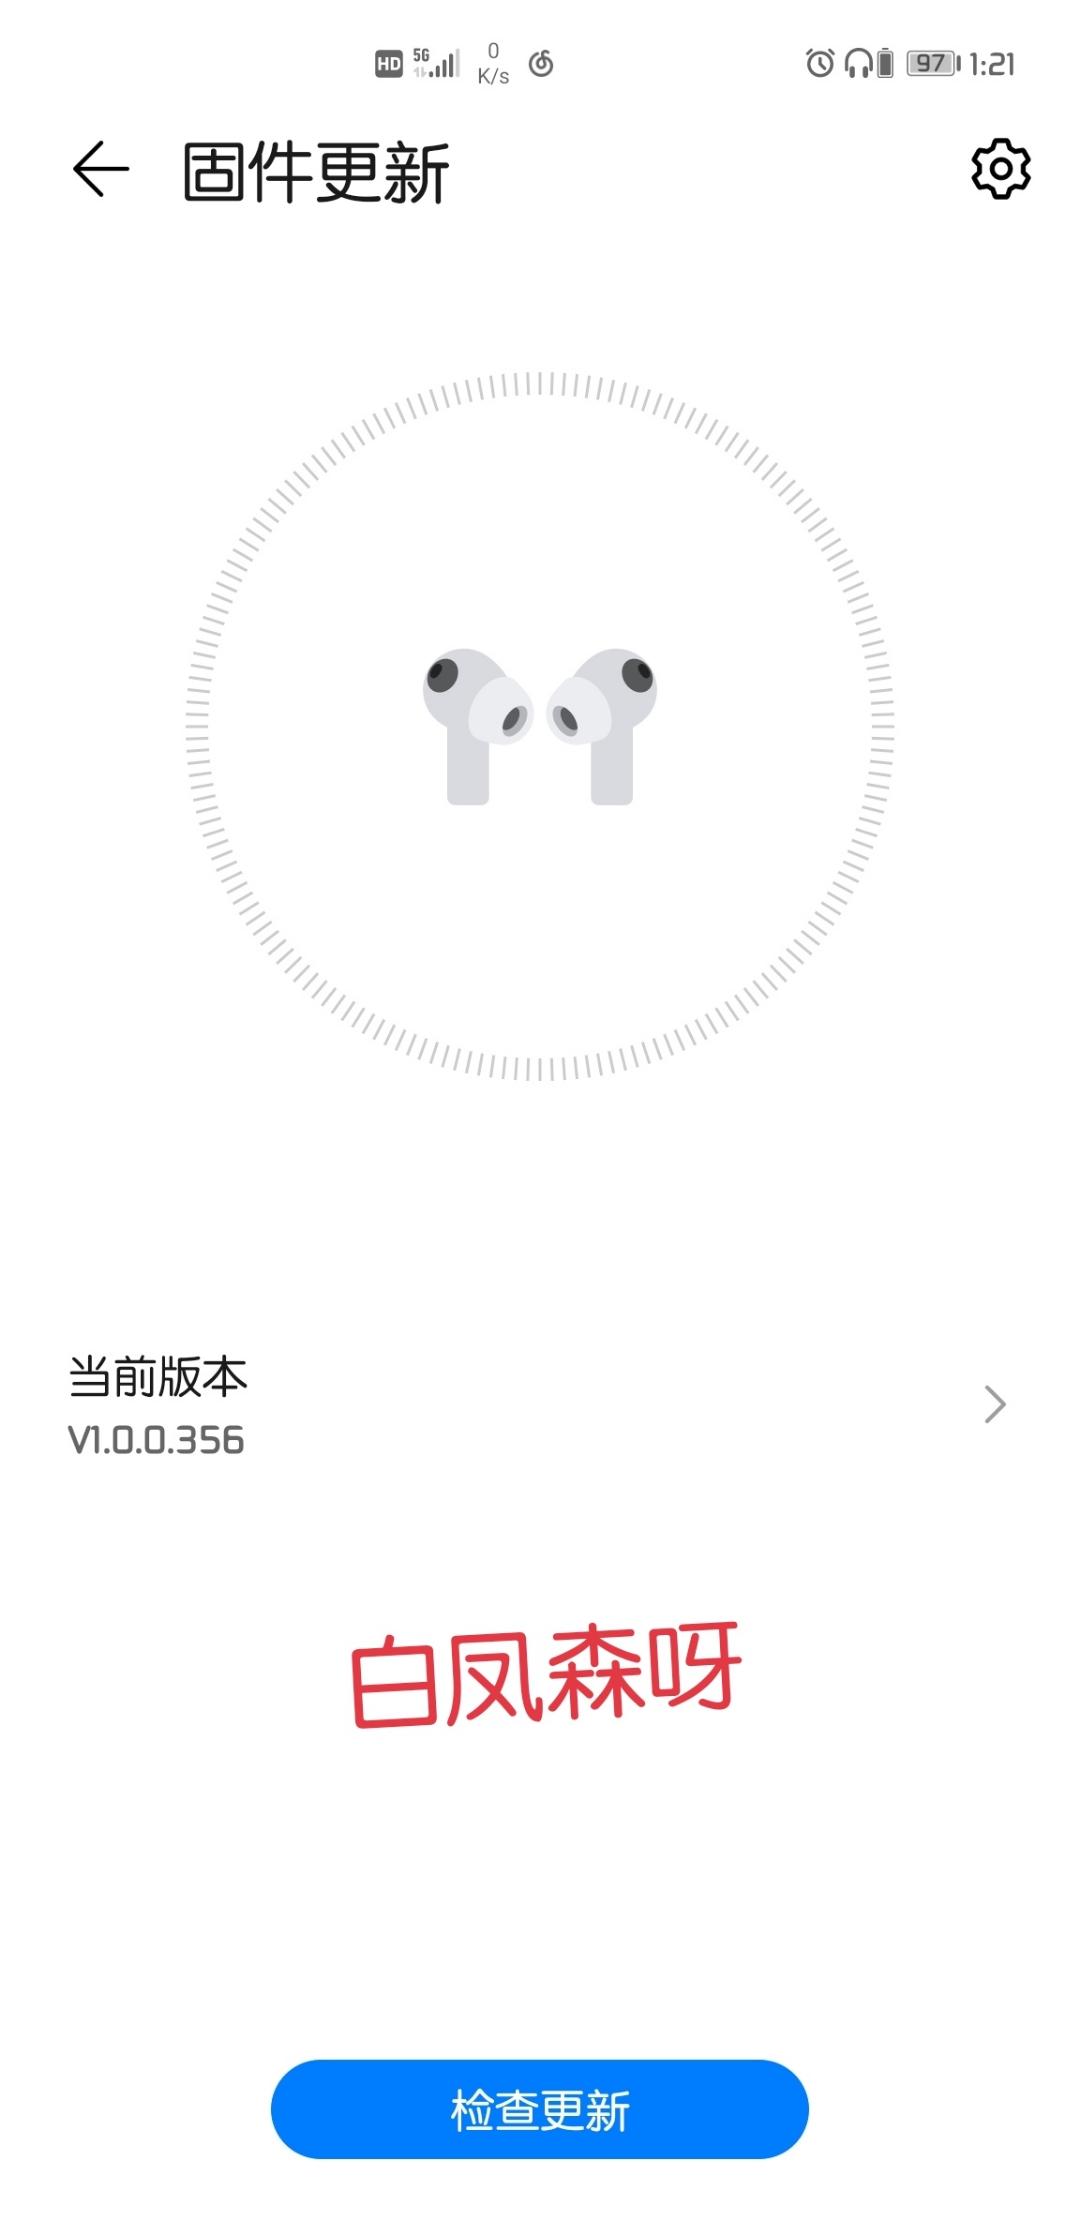 Screenshot_20210329_132131_com.huawei.smarthome_edit_664510315371519.jpg